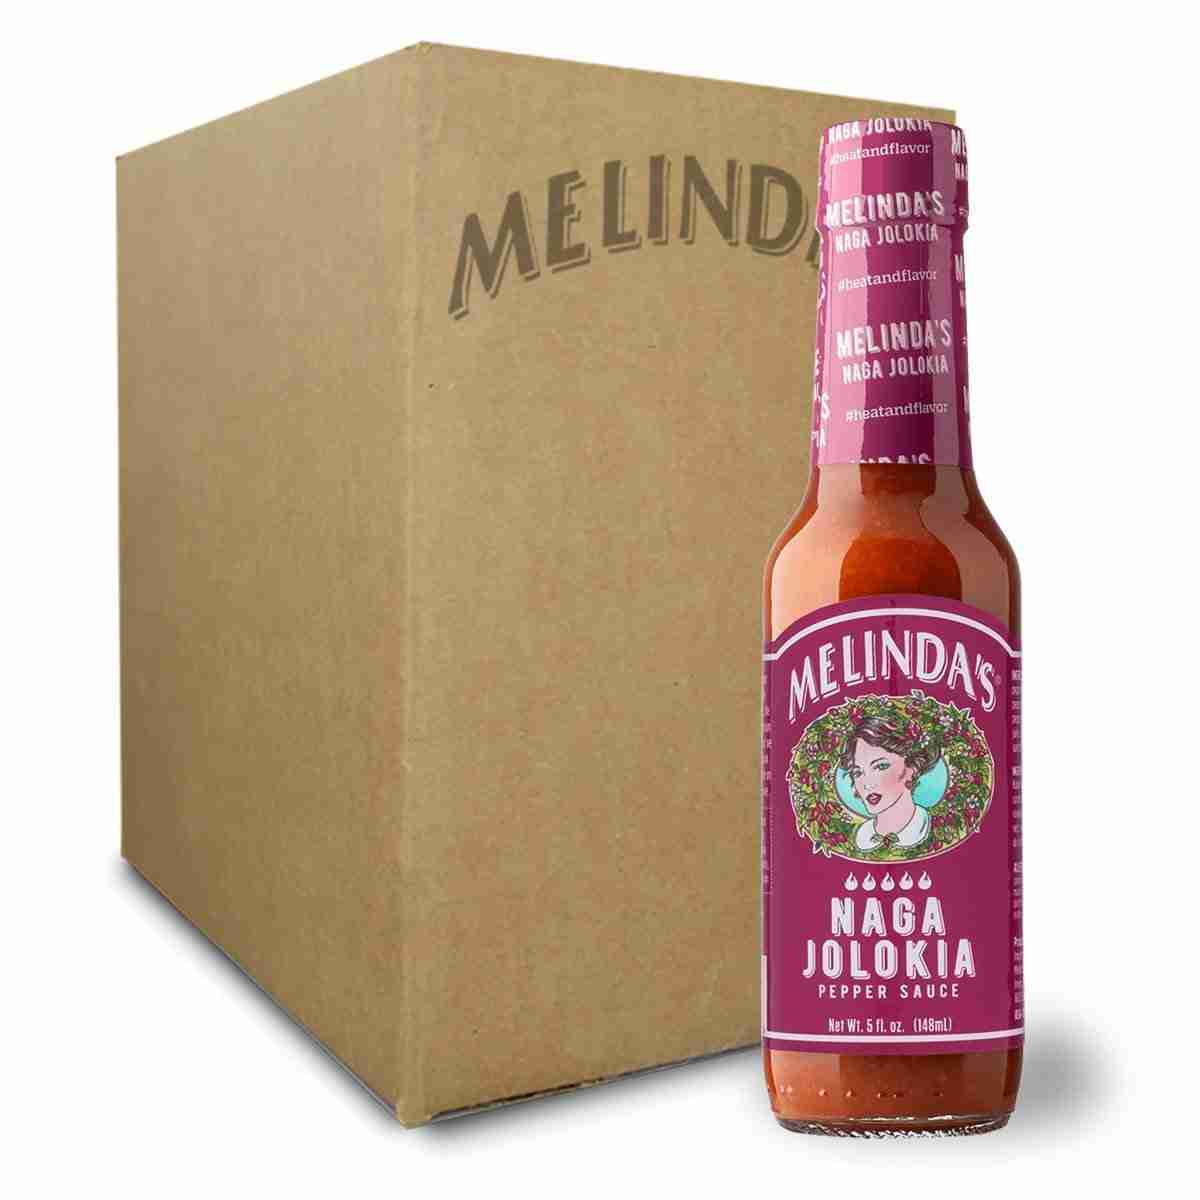 Melinda's Naga Jolokia Pepper Hot Sauce